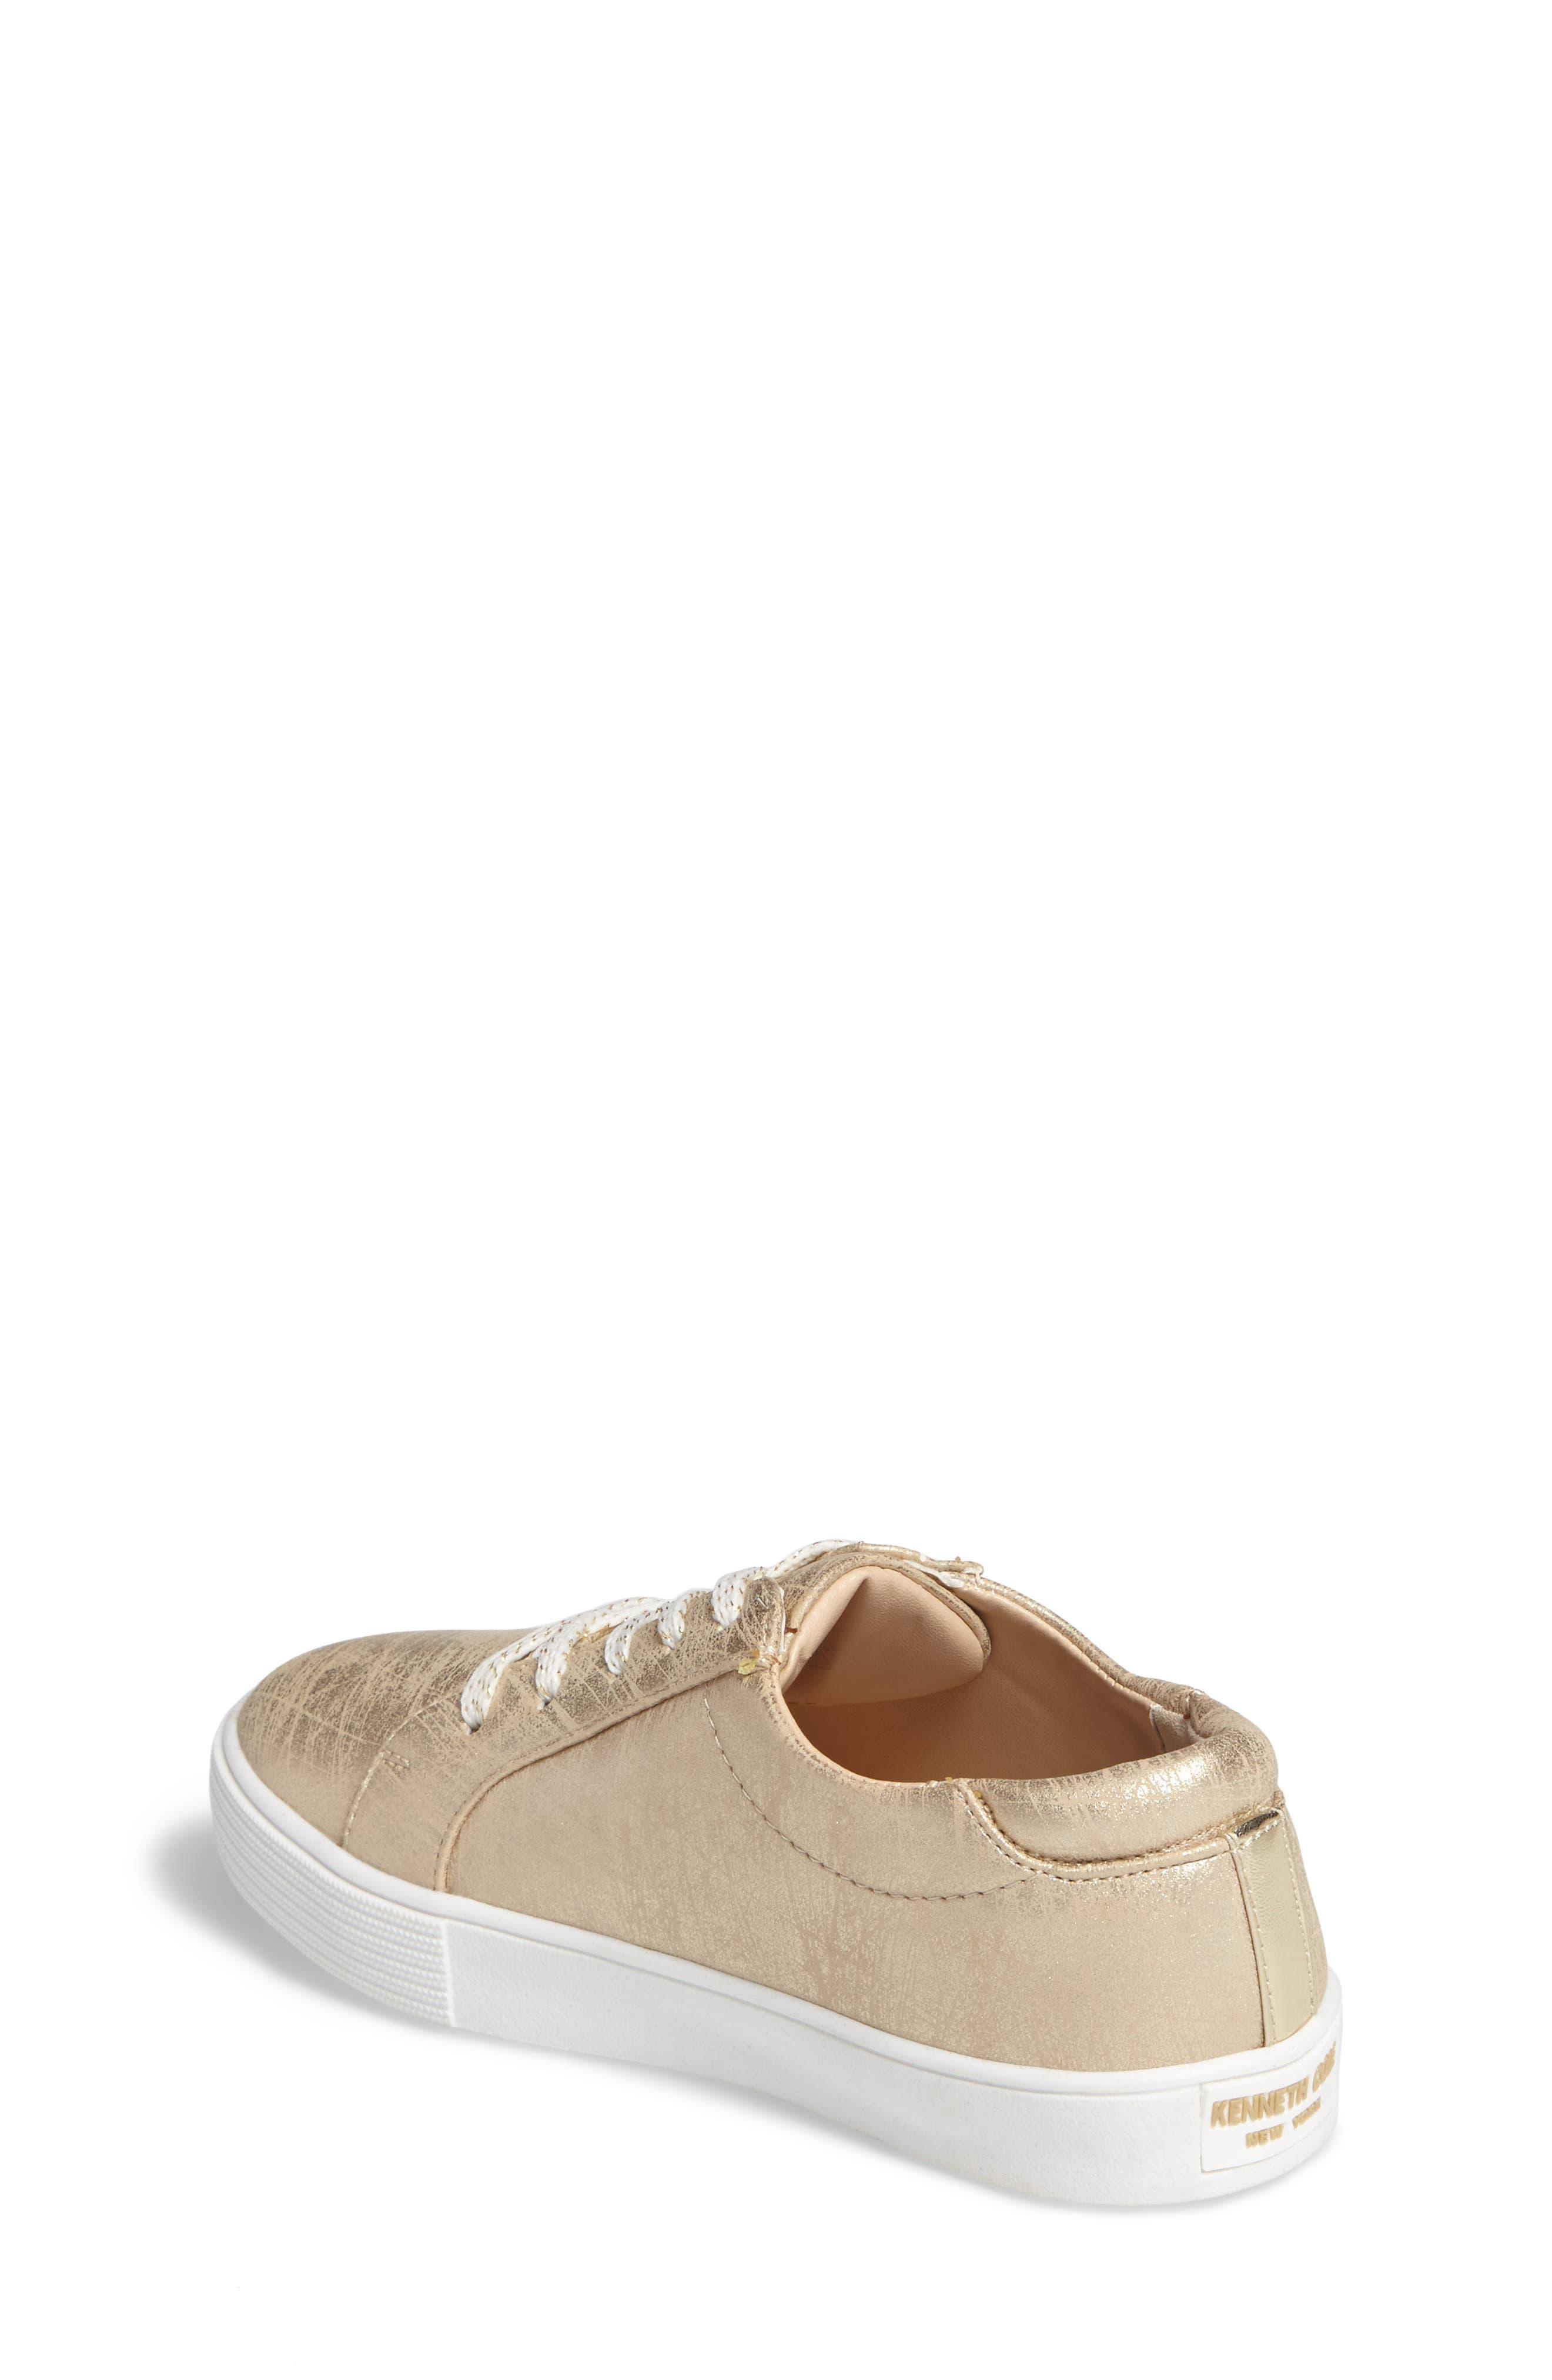 Kam Elastic Sneaker,                             Alternate thumbnail 2, color,                             Gold Brushed